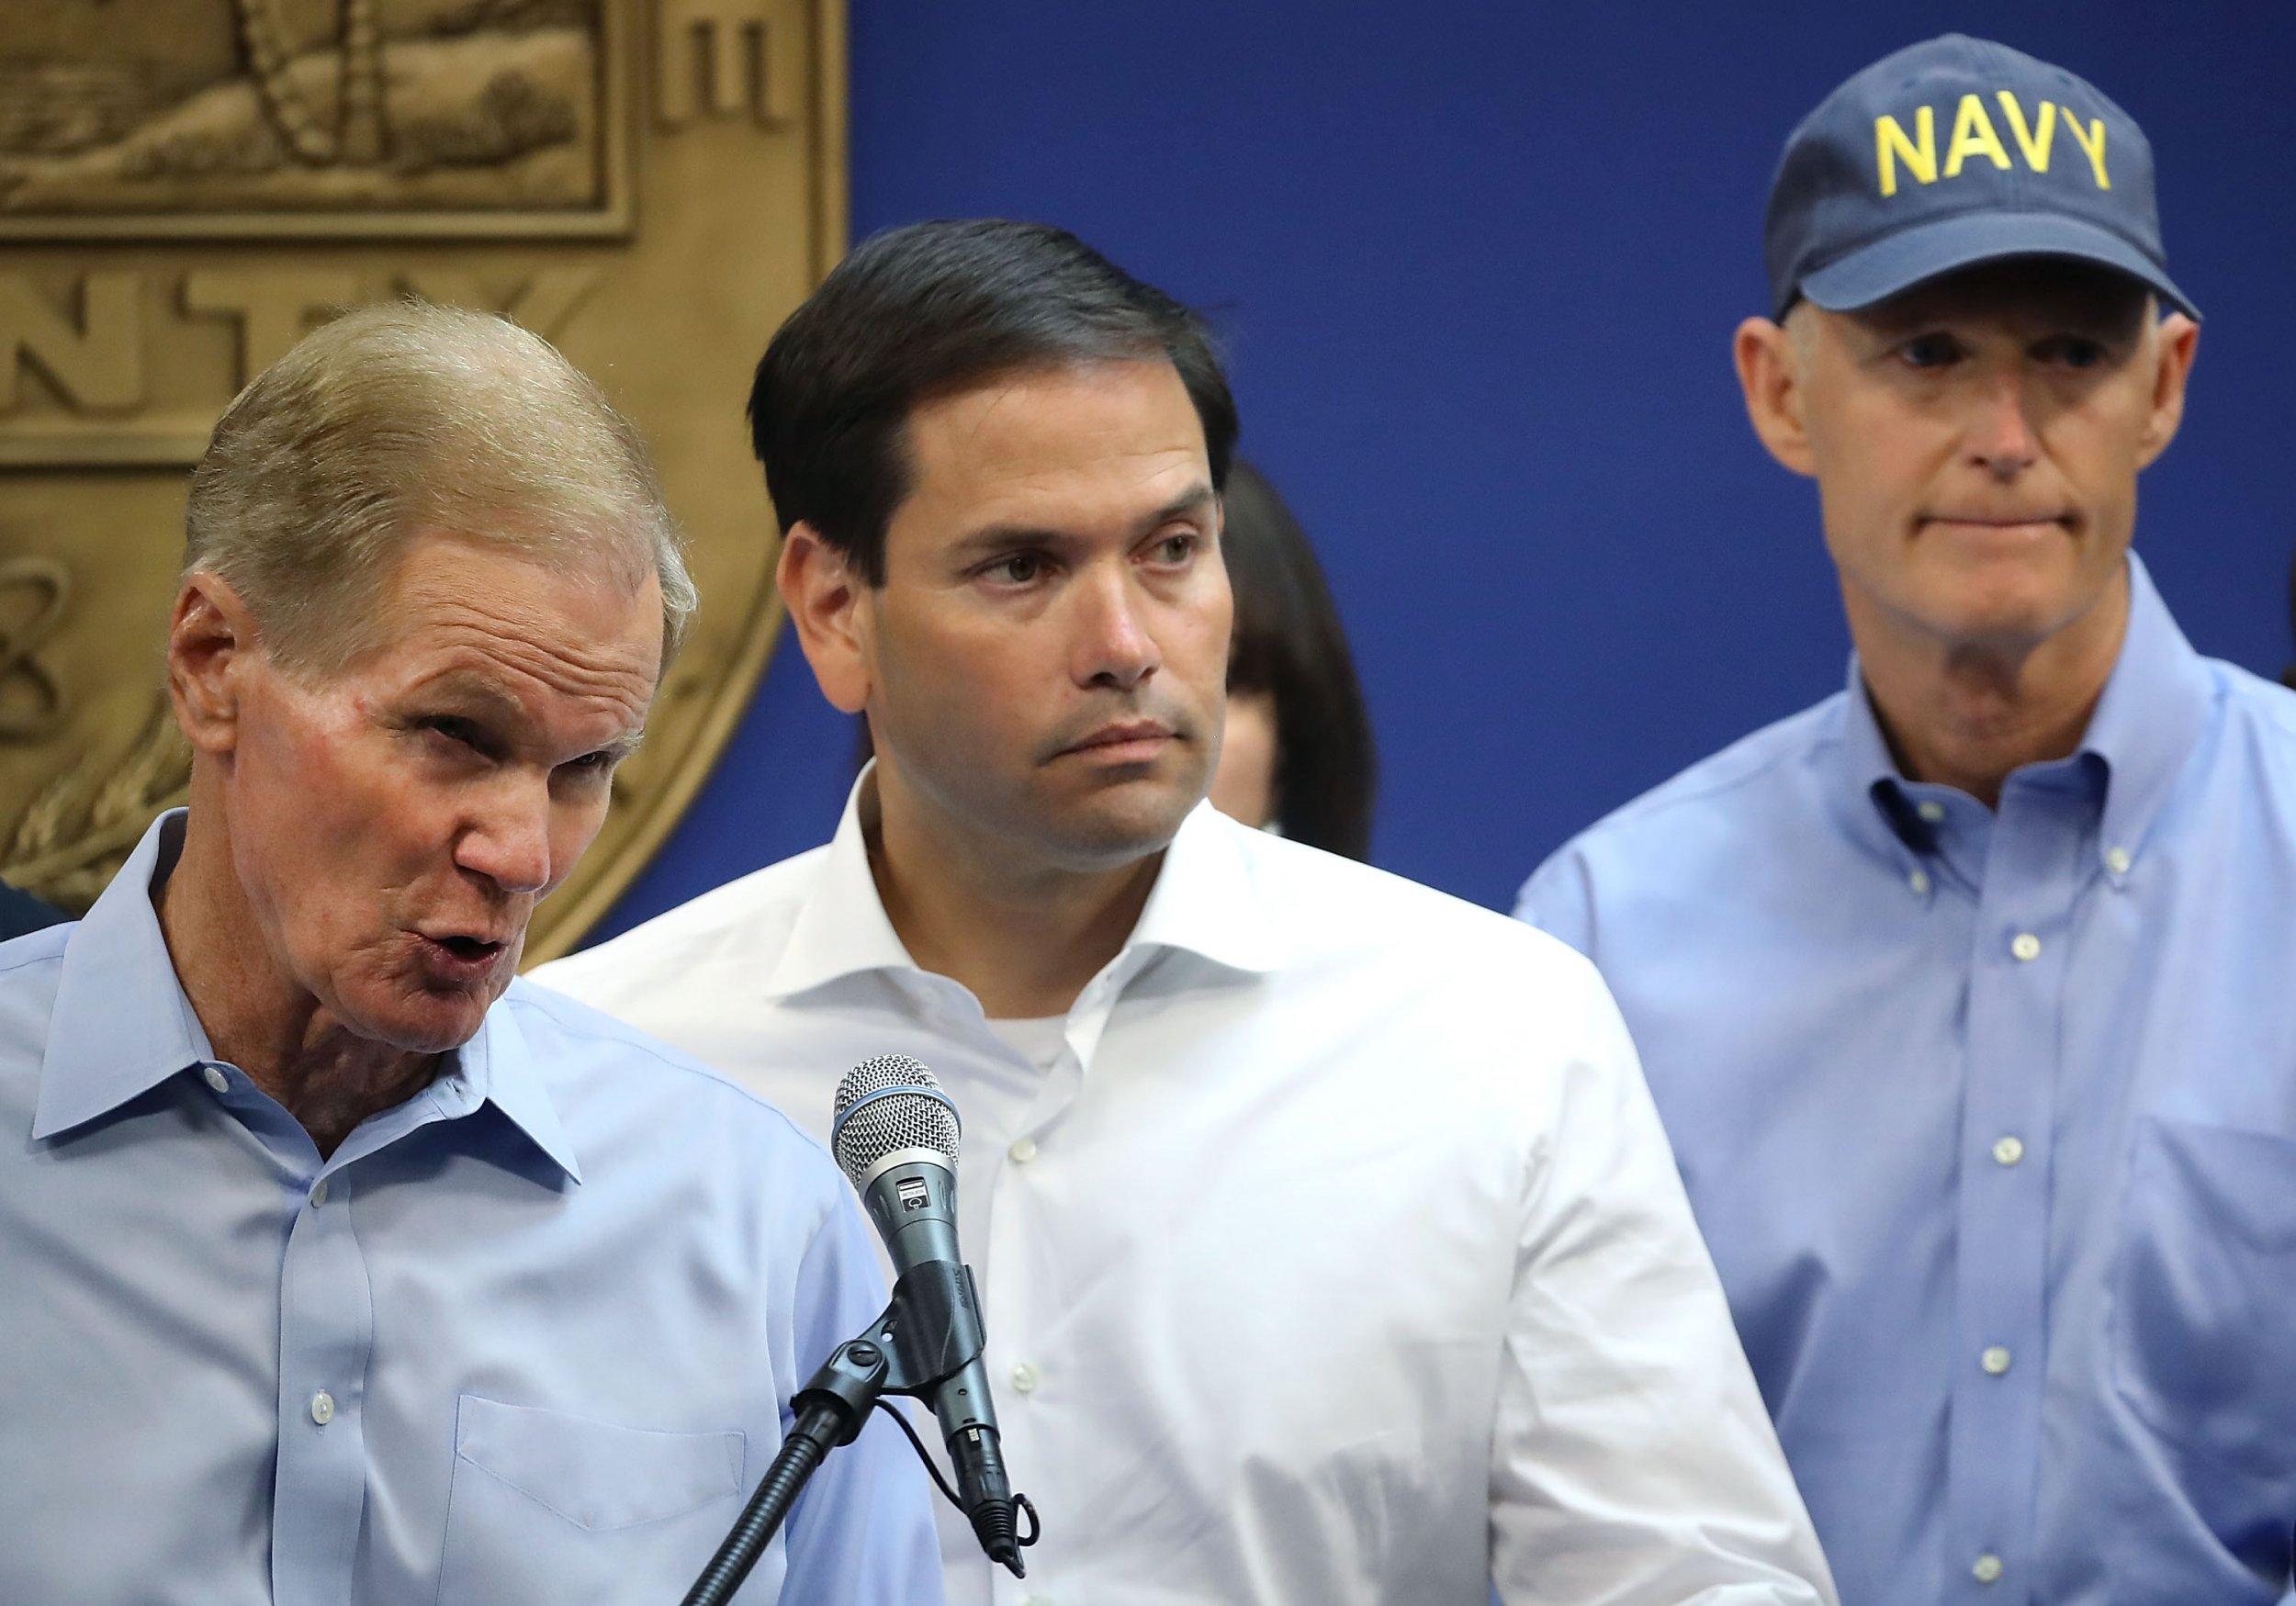 Florida Senate Race: Rick Scott, Bill Nelson Headed for Statewide Recount